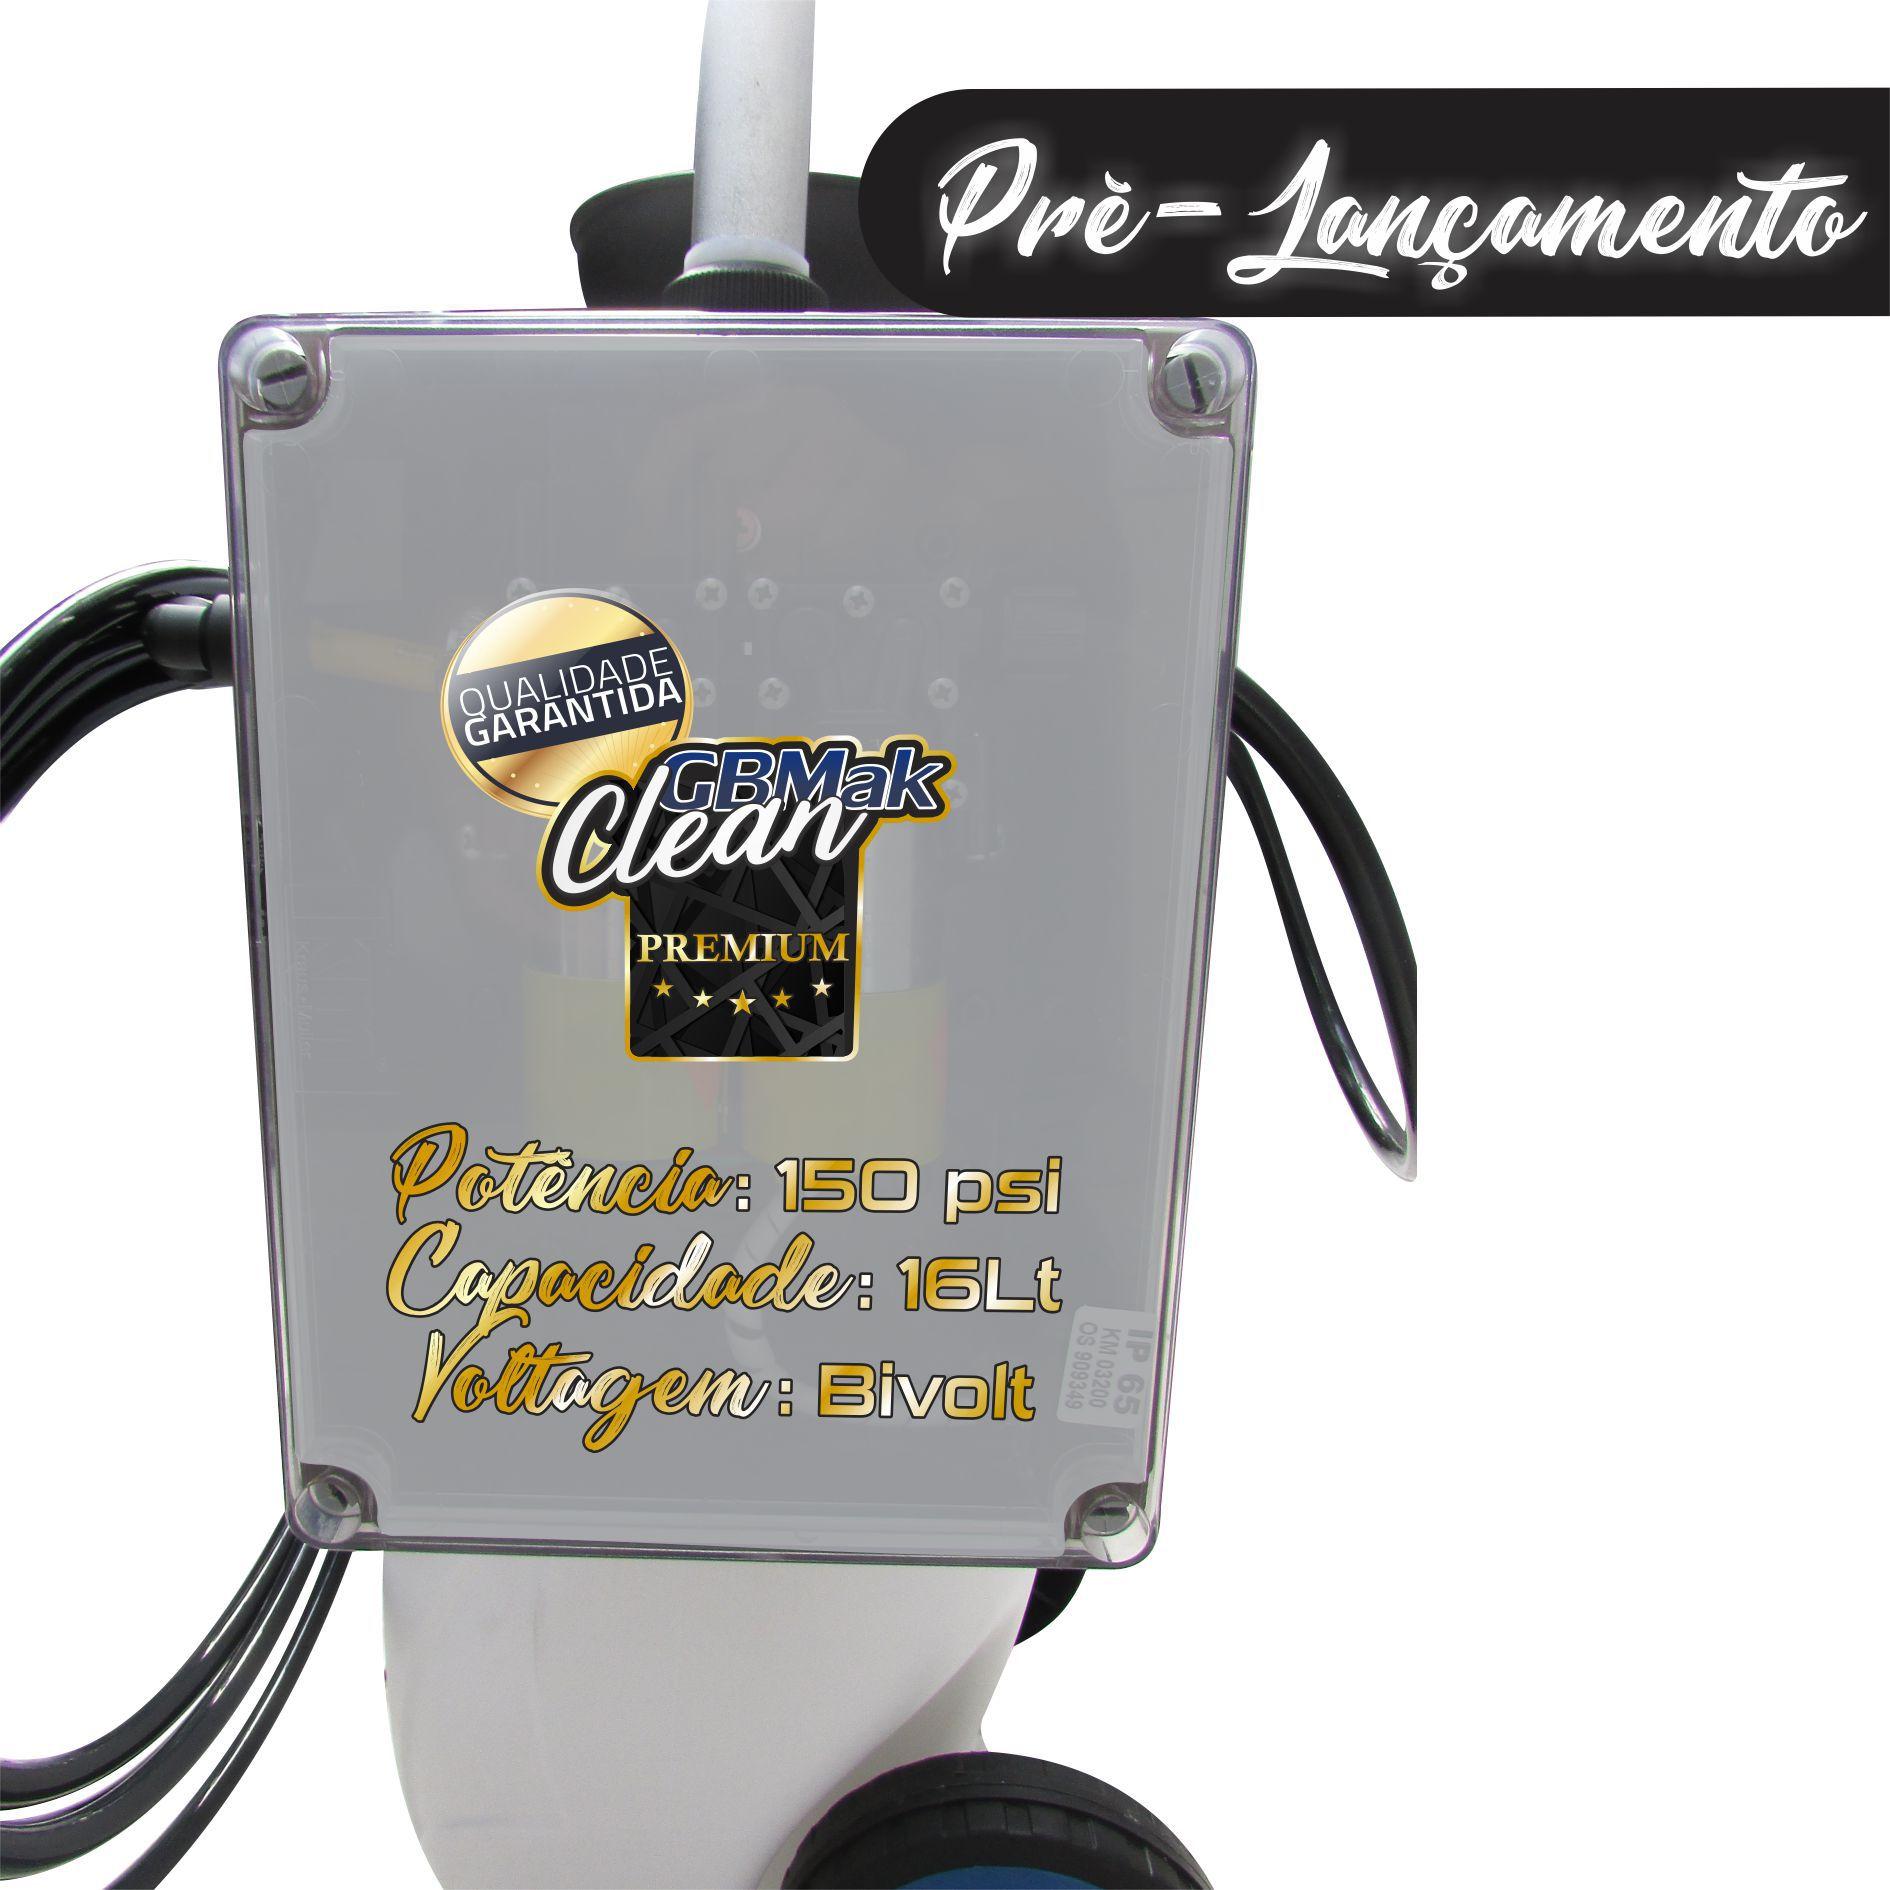 MAQUINA PARA LIMPEZA DE AR CONDICIONADO SPLIT GBMAK PREMIUM 150PSI 16 LITROS AUTOMATICA + COLETOR 30K